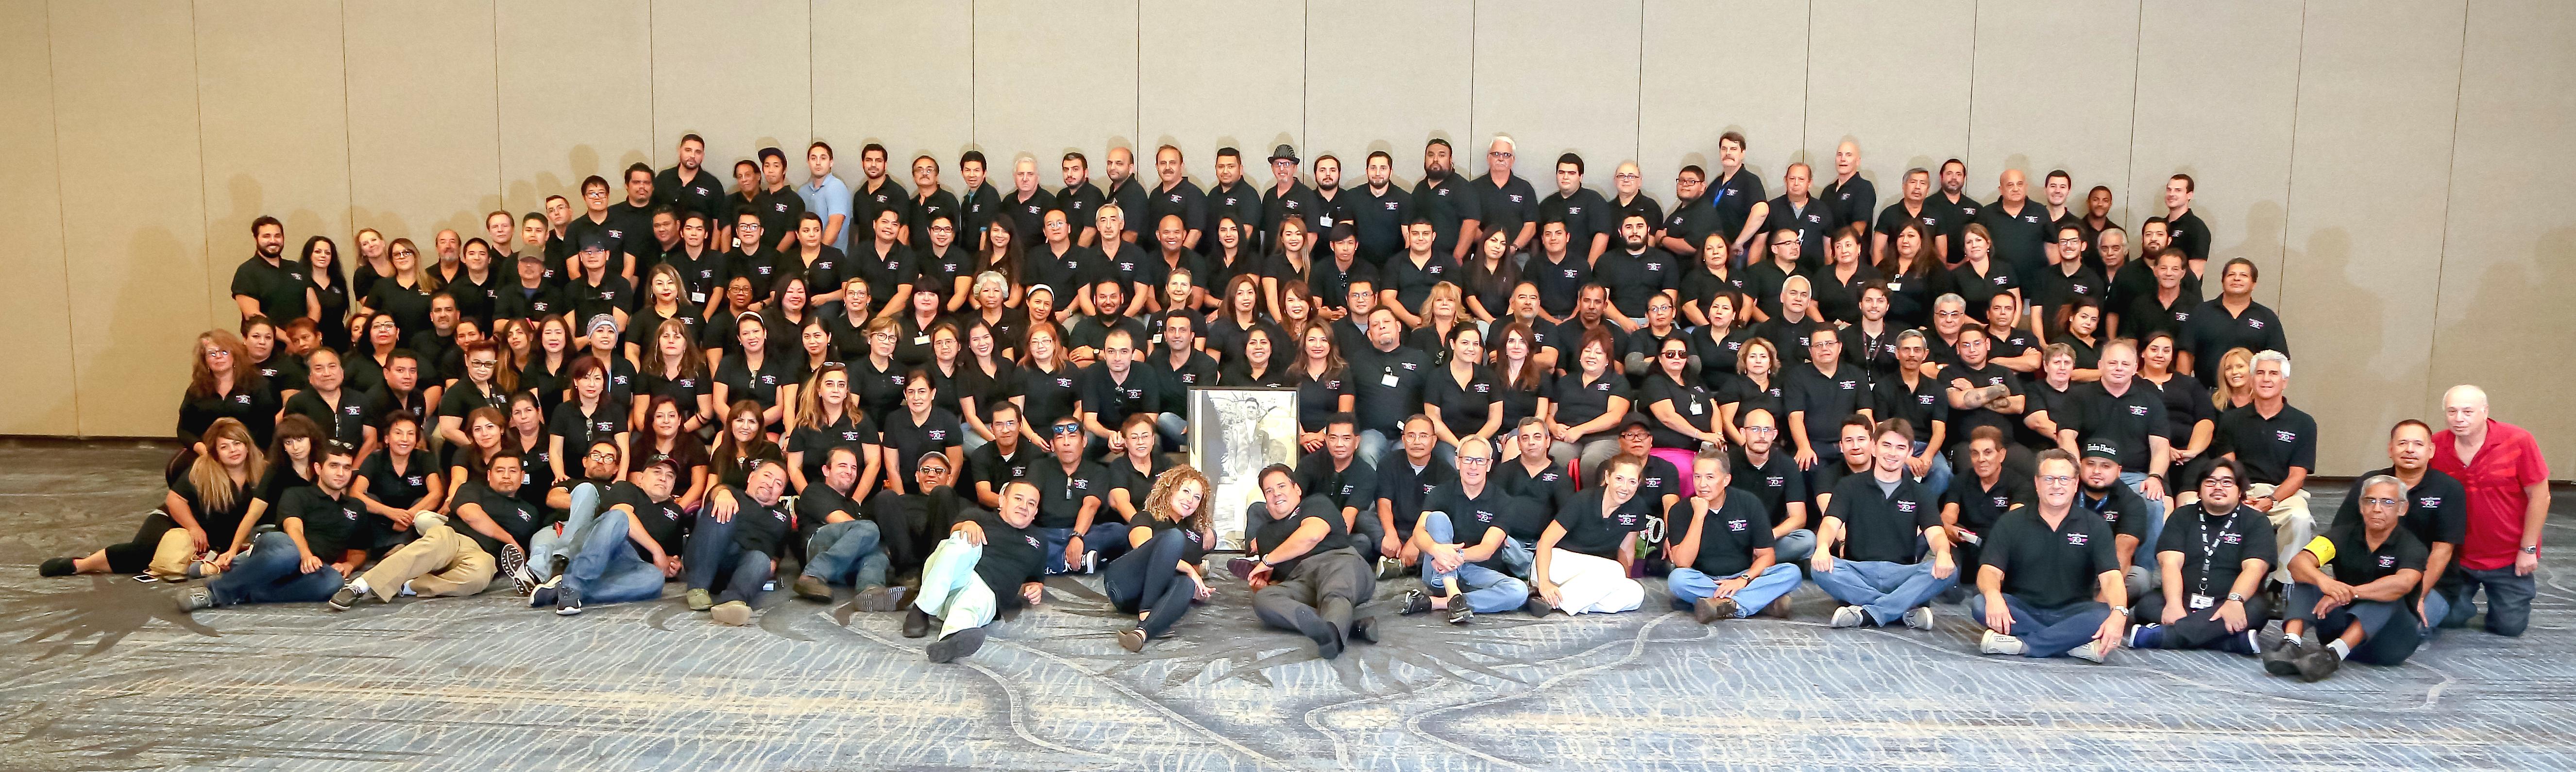 Hydra-Electric Company 70th Anniversary Celebration